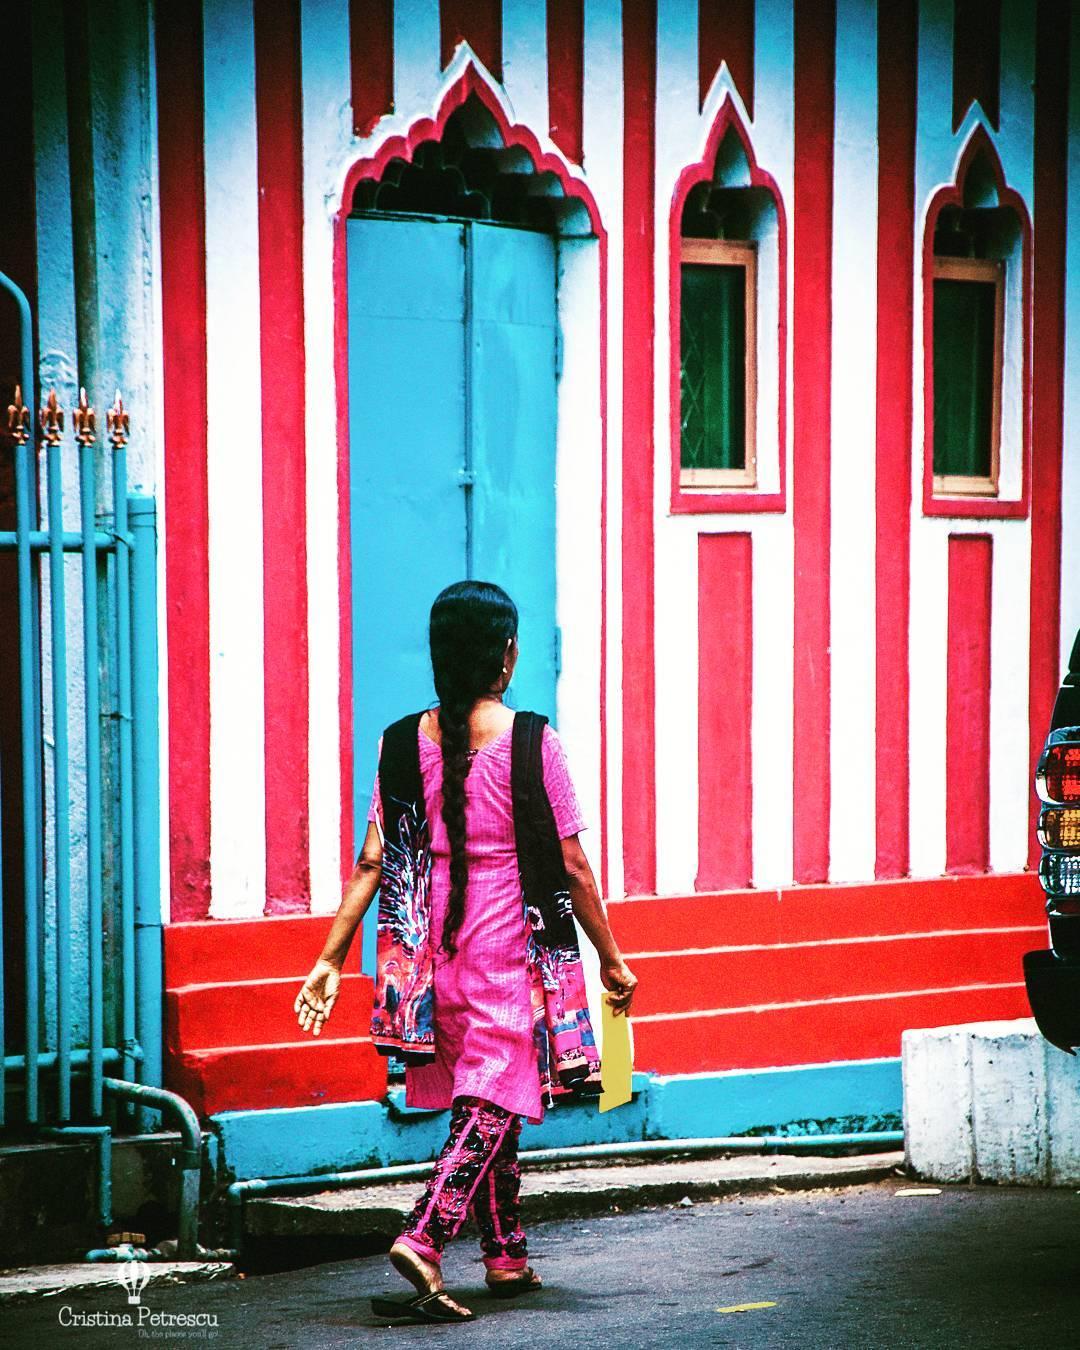 chris tudos photos travel (25).jpg